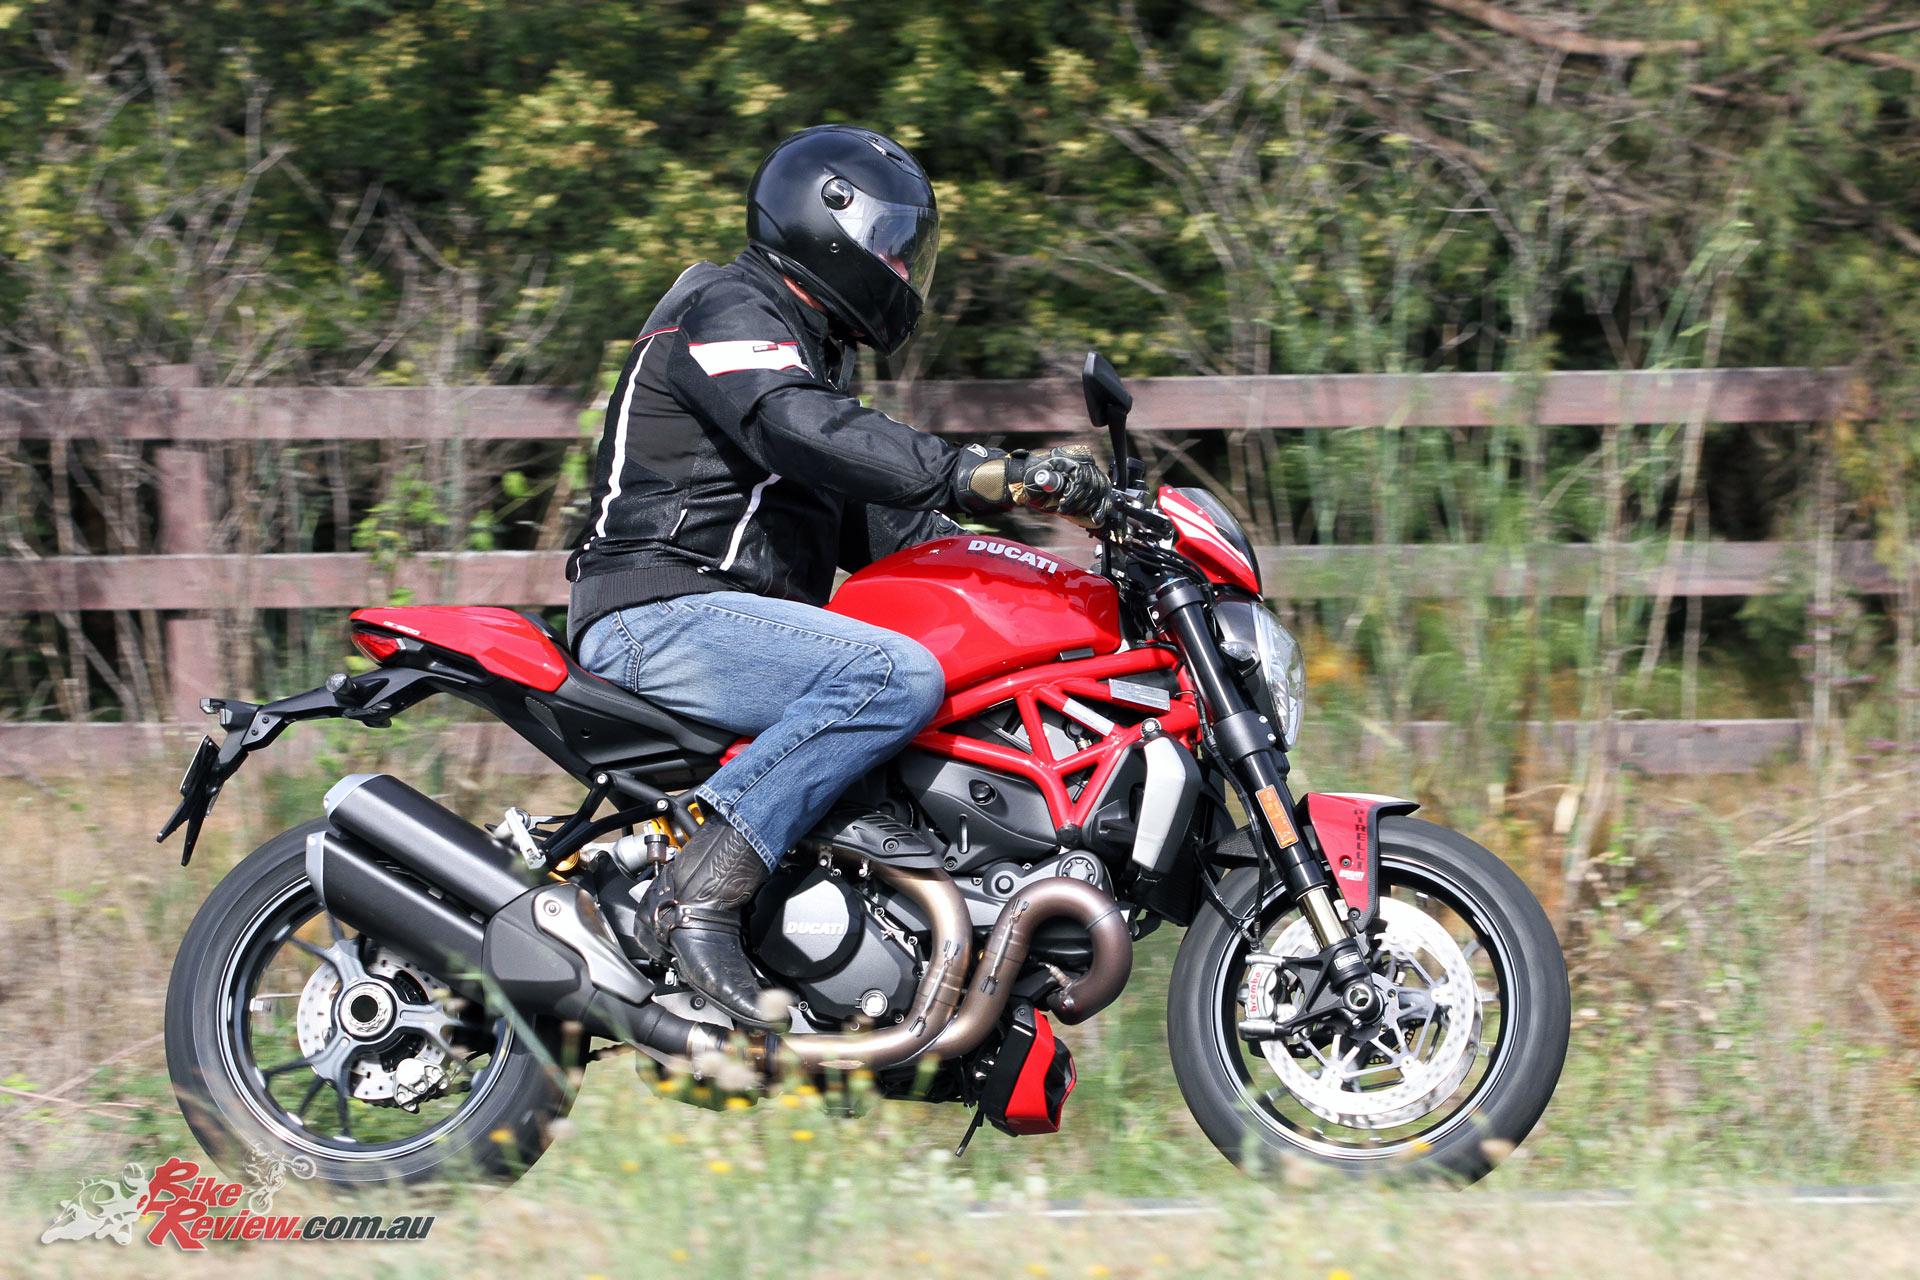 review 2016 ducati monster 1200 r bike review. Black Bedroom Furniture Sets. Home Design Ideas